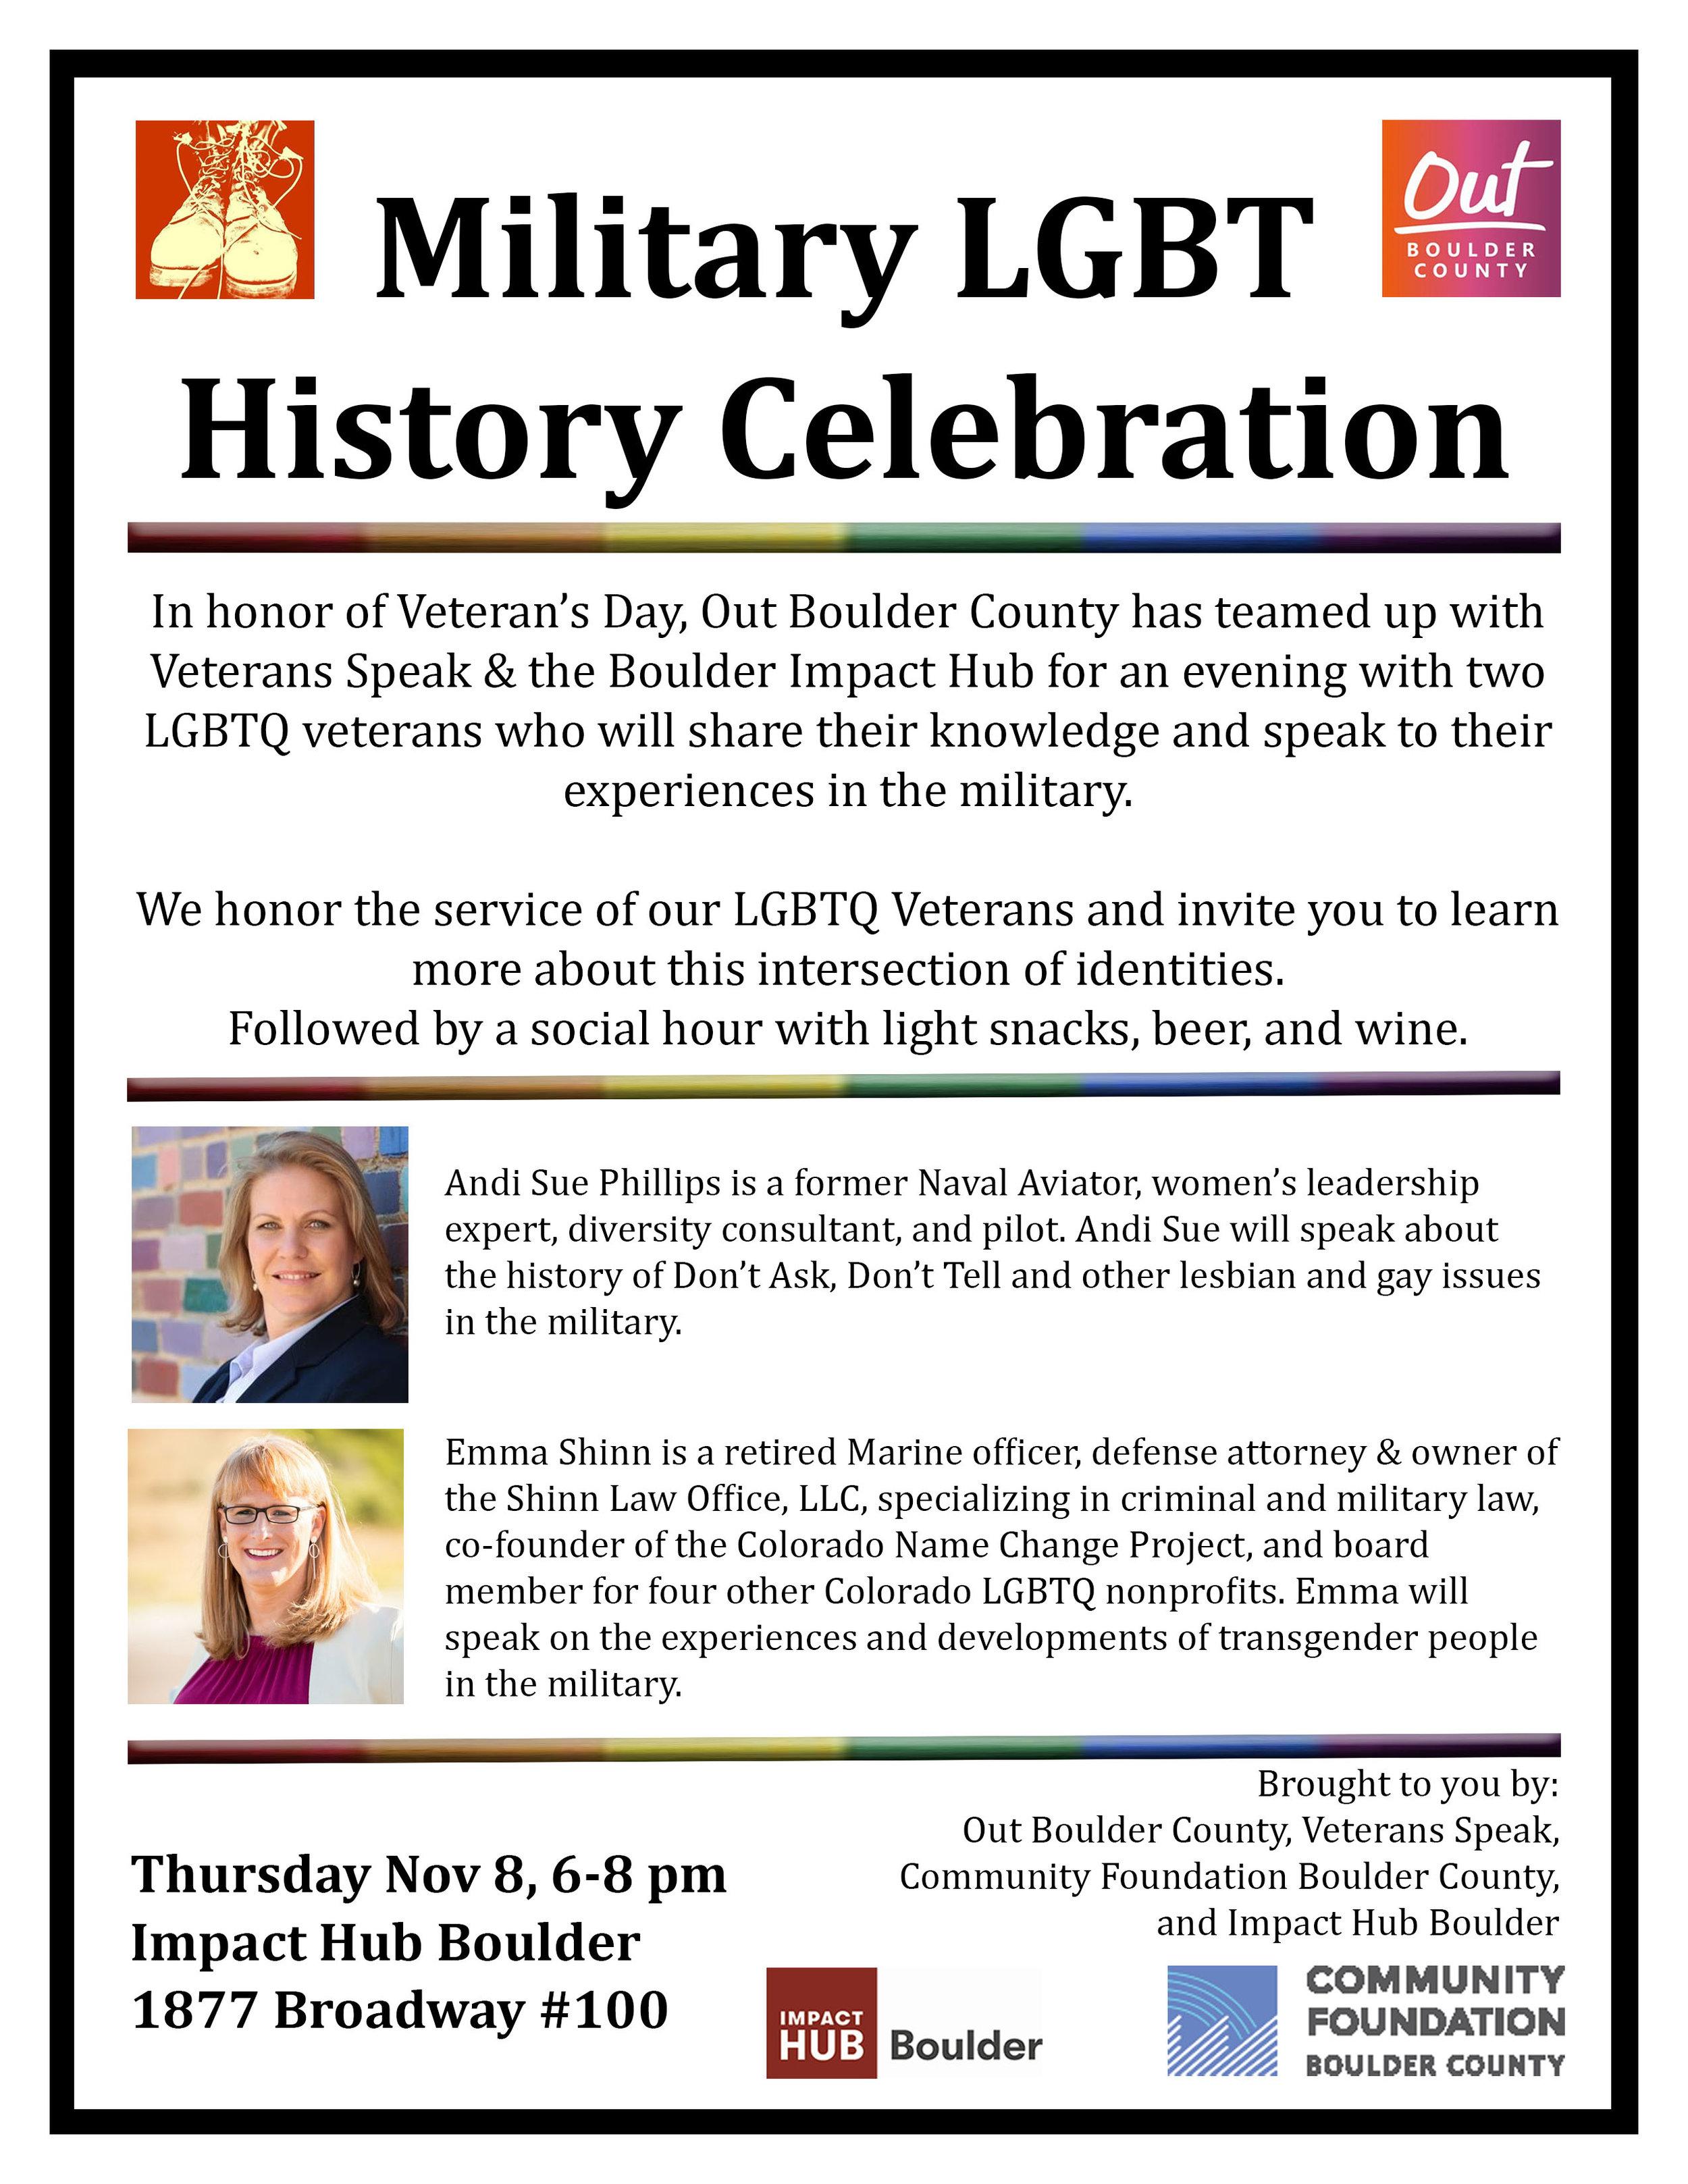 VeteransDay_LGBTMilitaryHistory_event.jpg